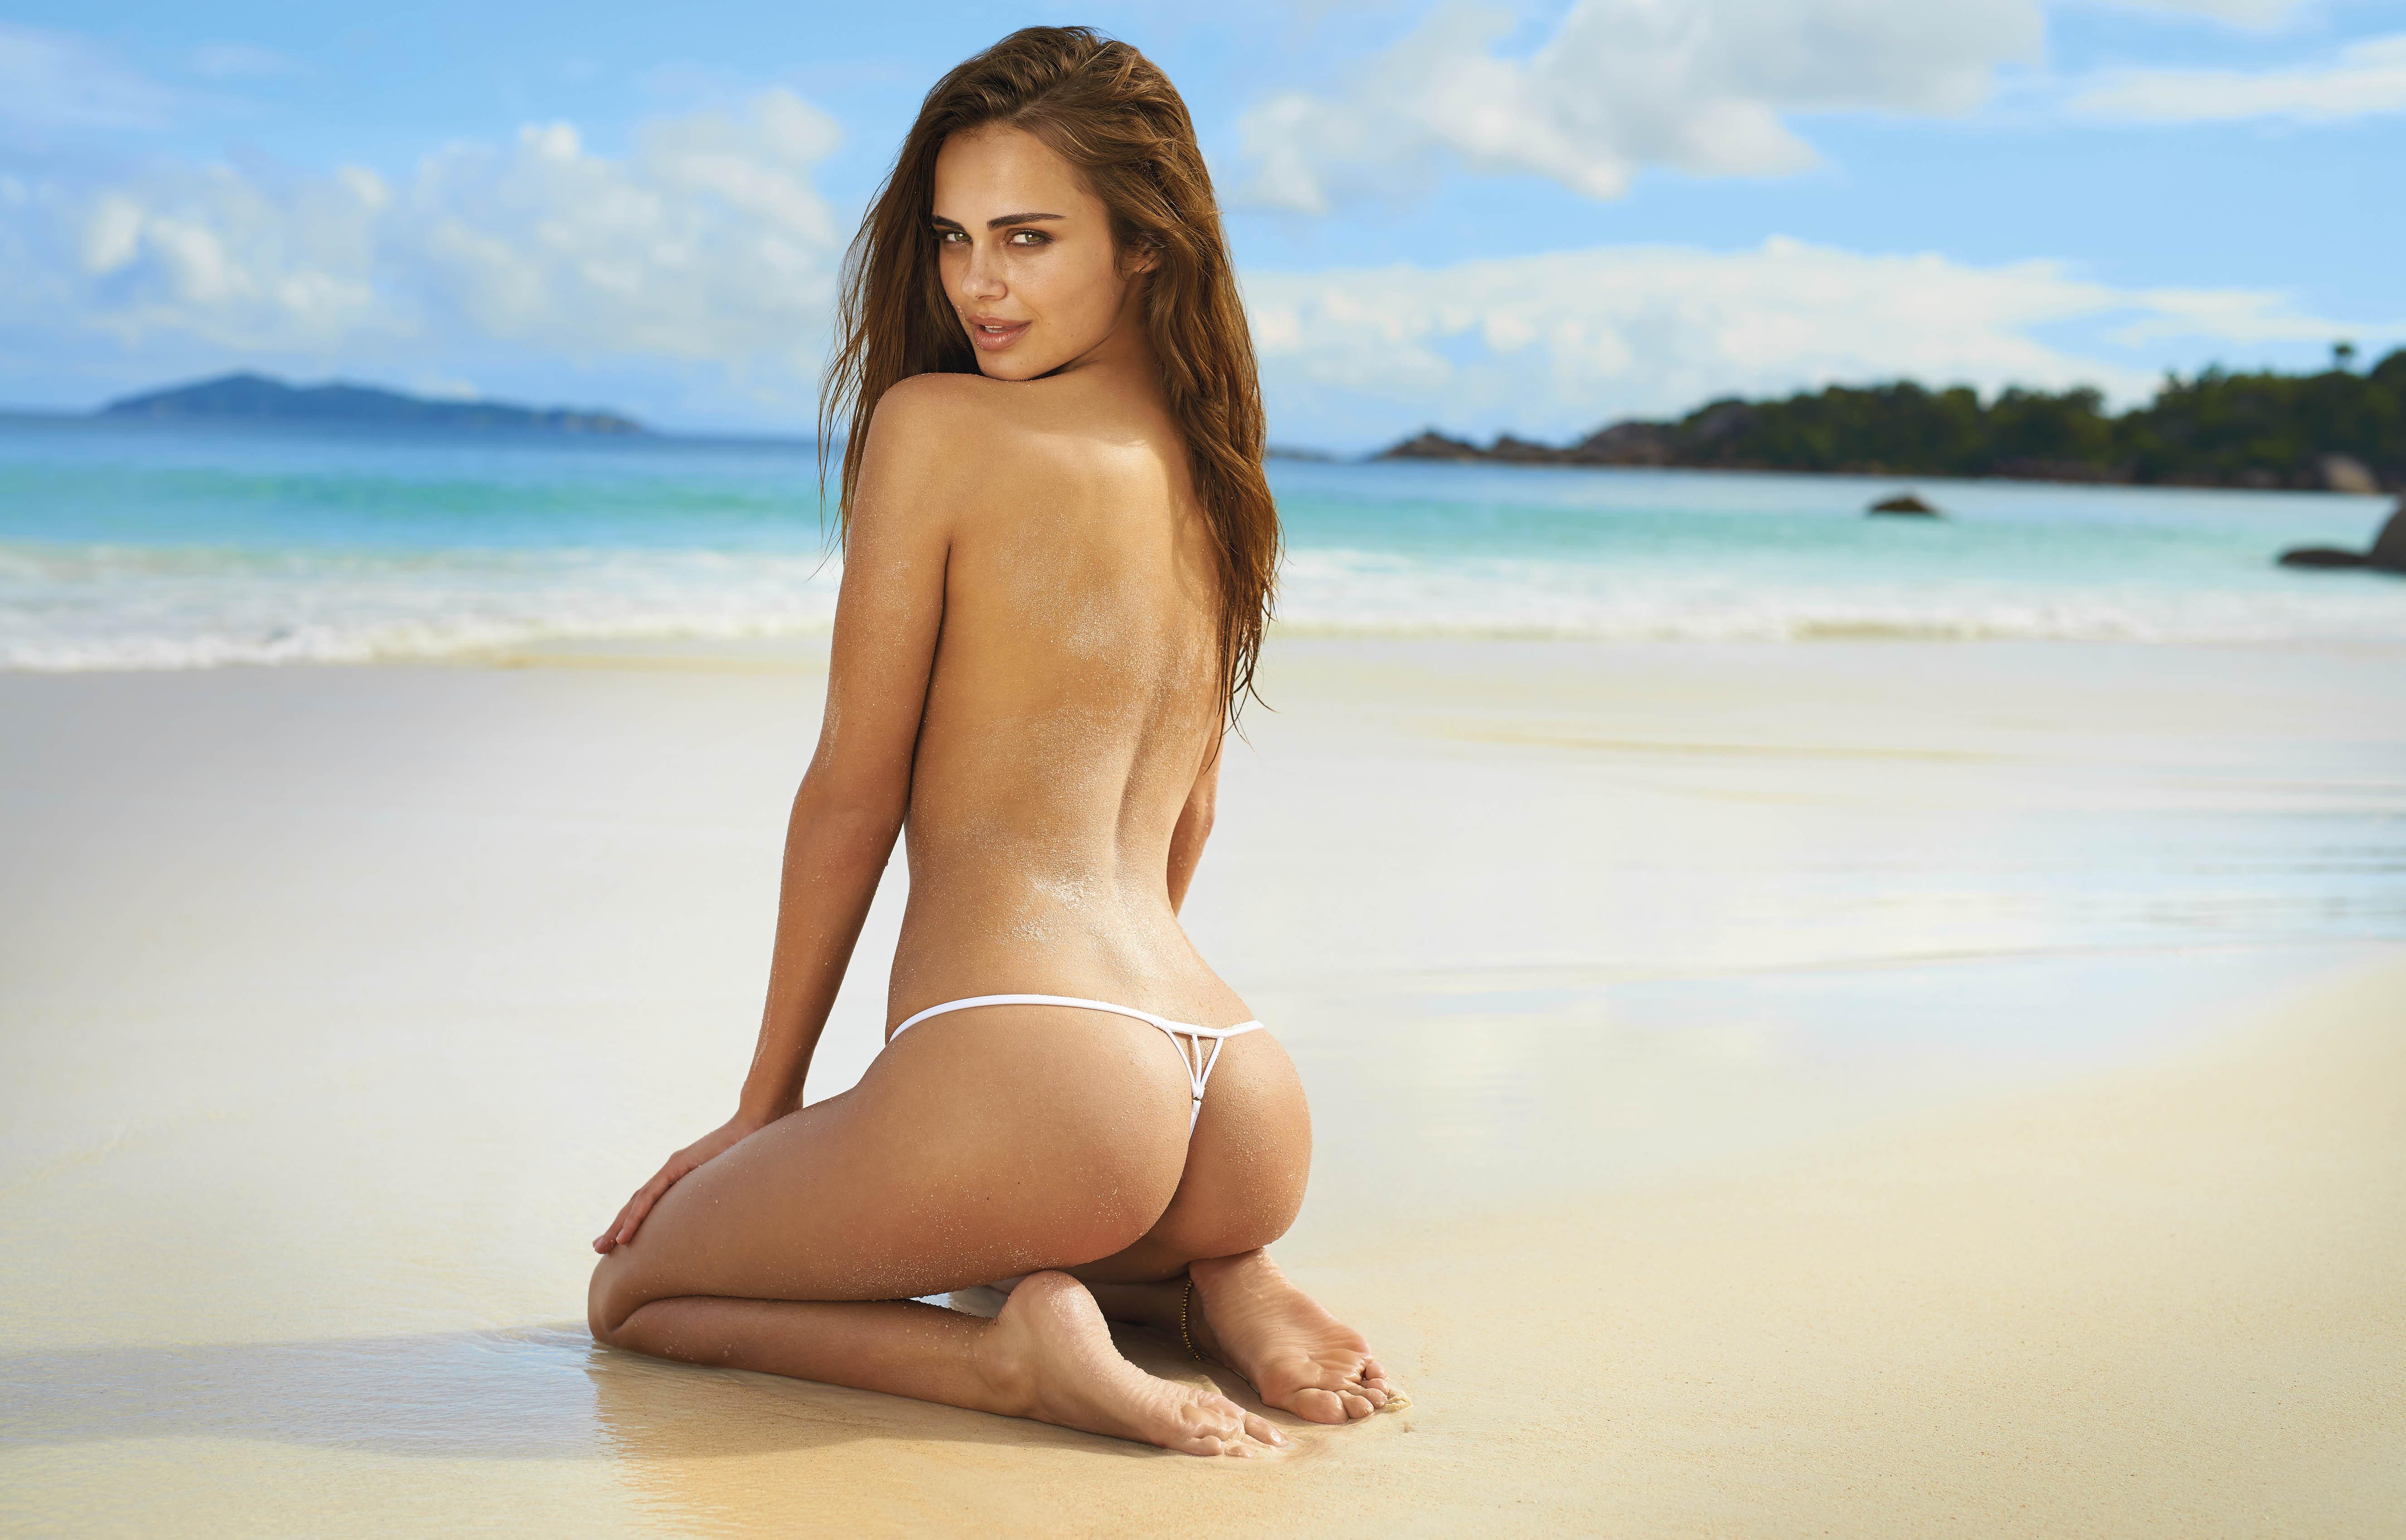 Naked hot bikini girls 10